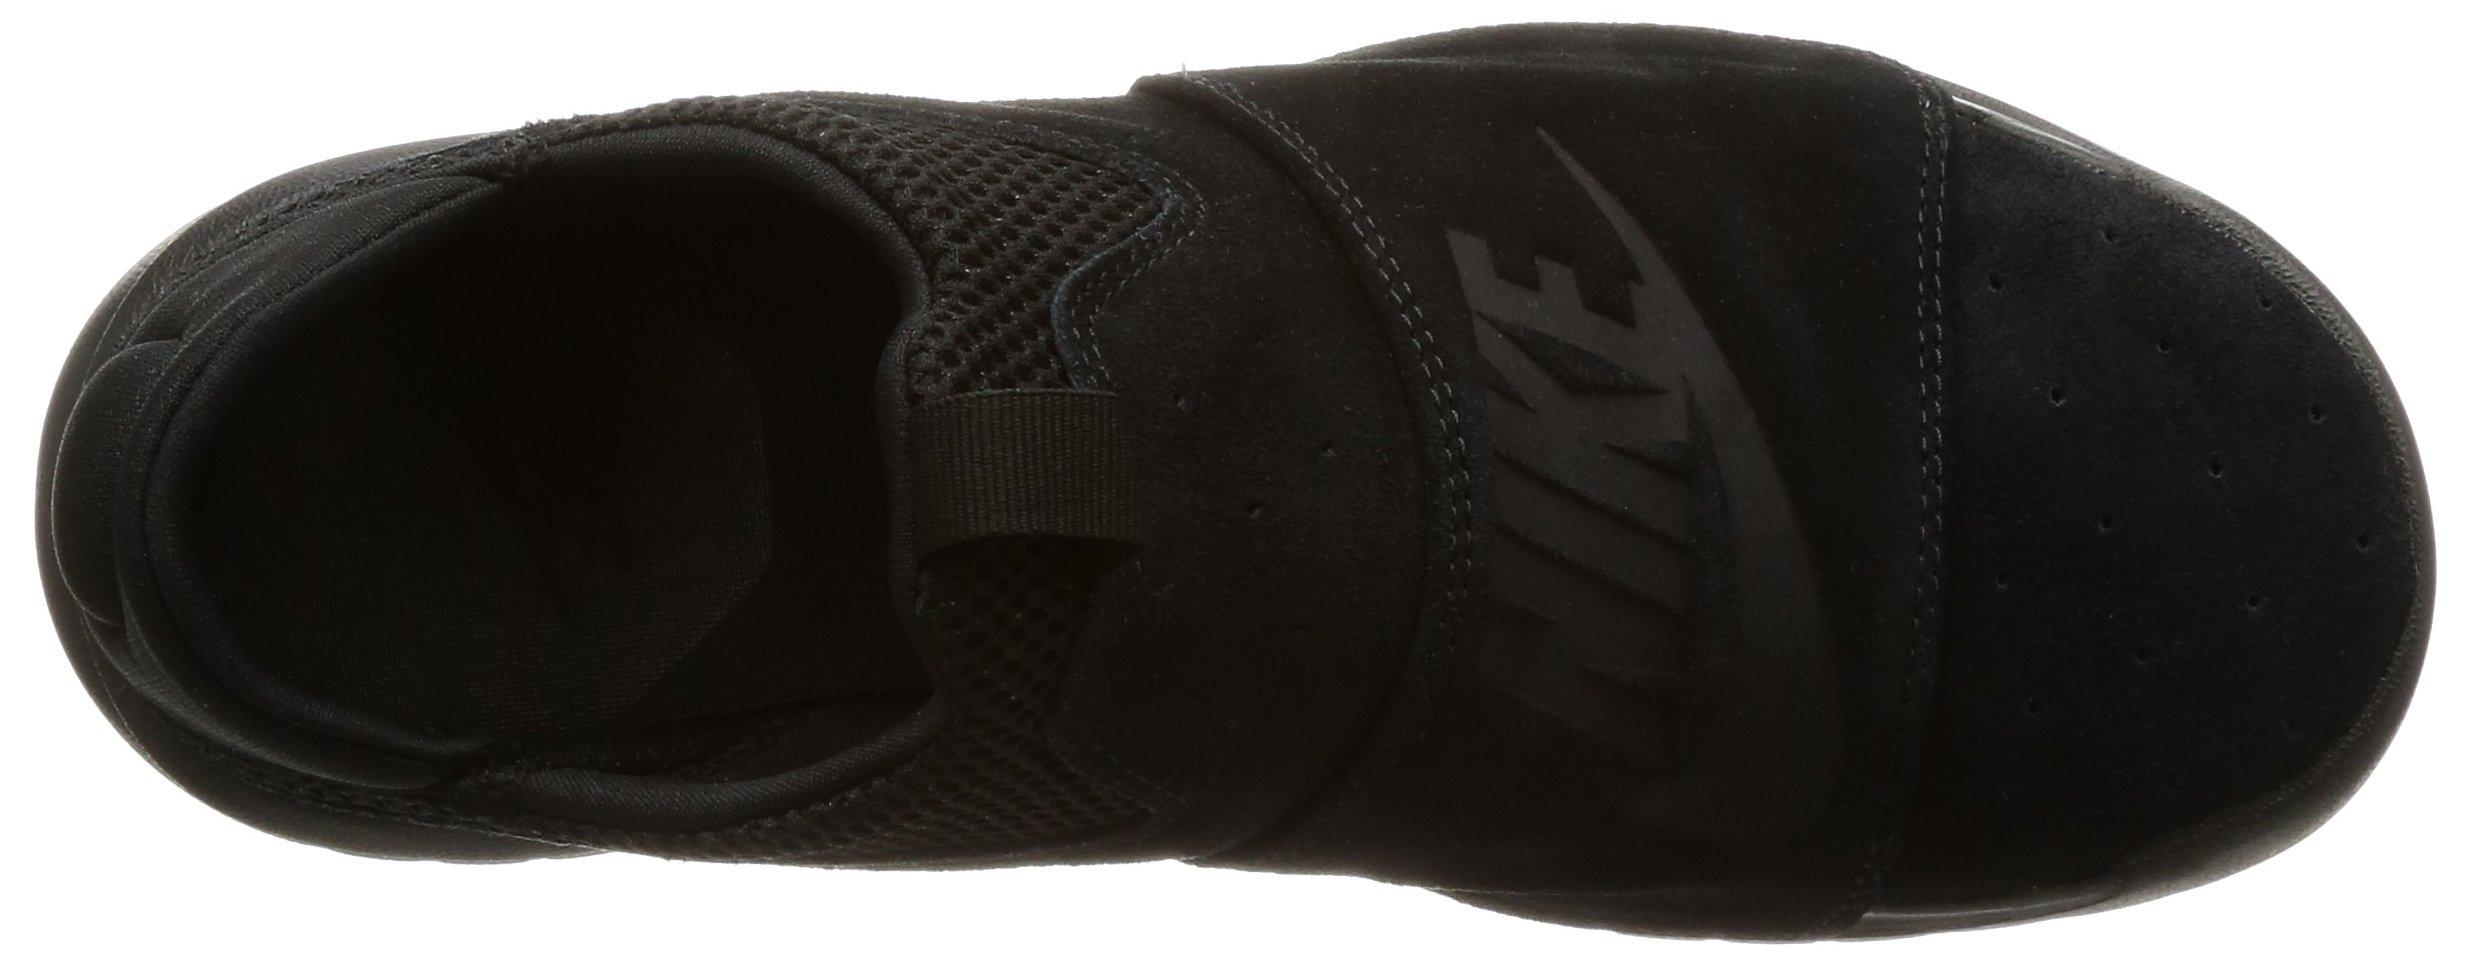 Nike BENASSI SLP Mens fashion-sneakers 882410-003_9.5 - BLACK/BLACK-BLACK by NIKE (Image #7)